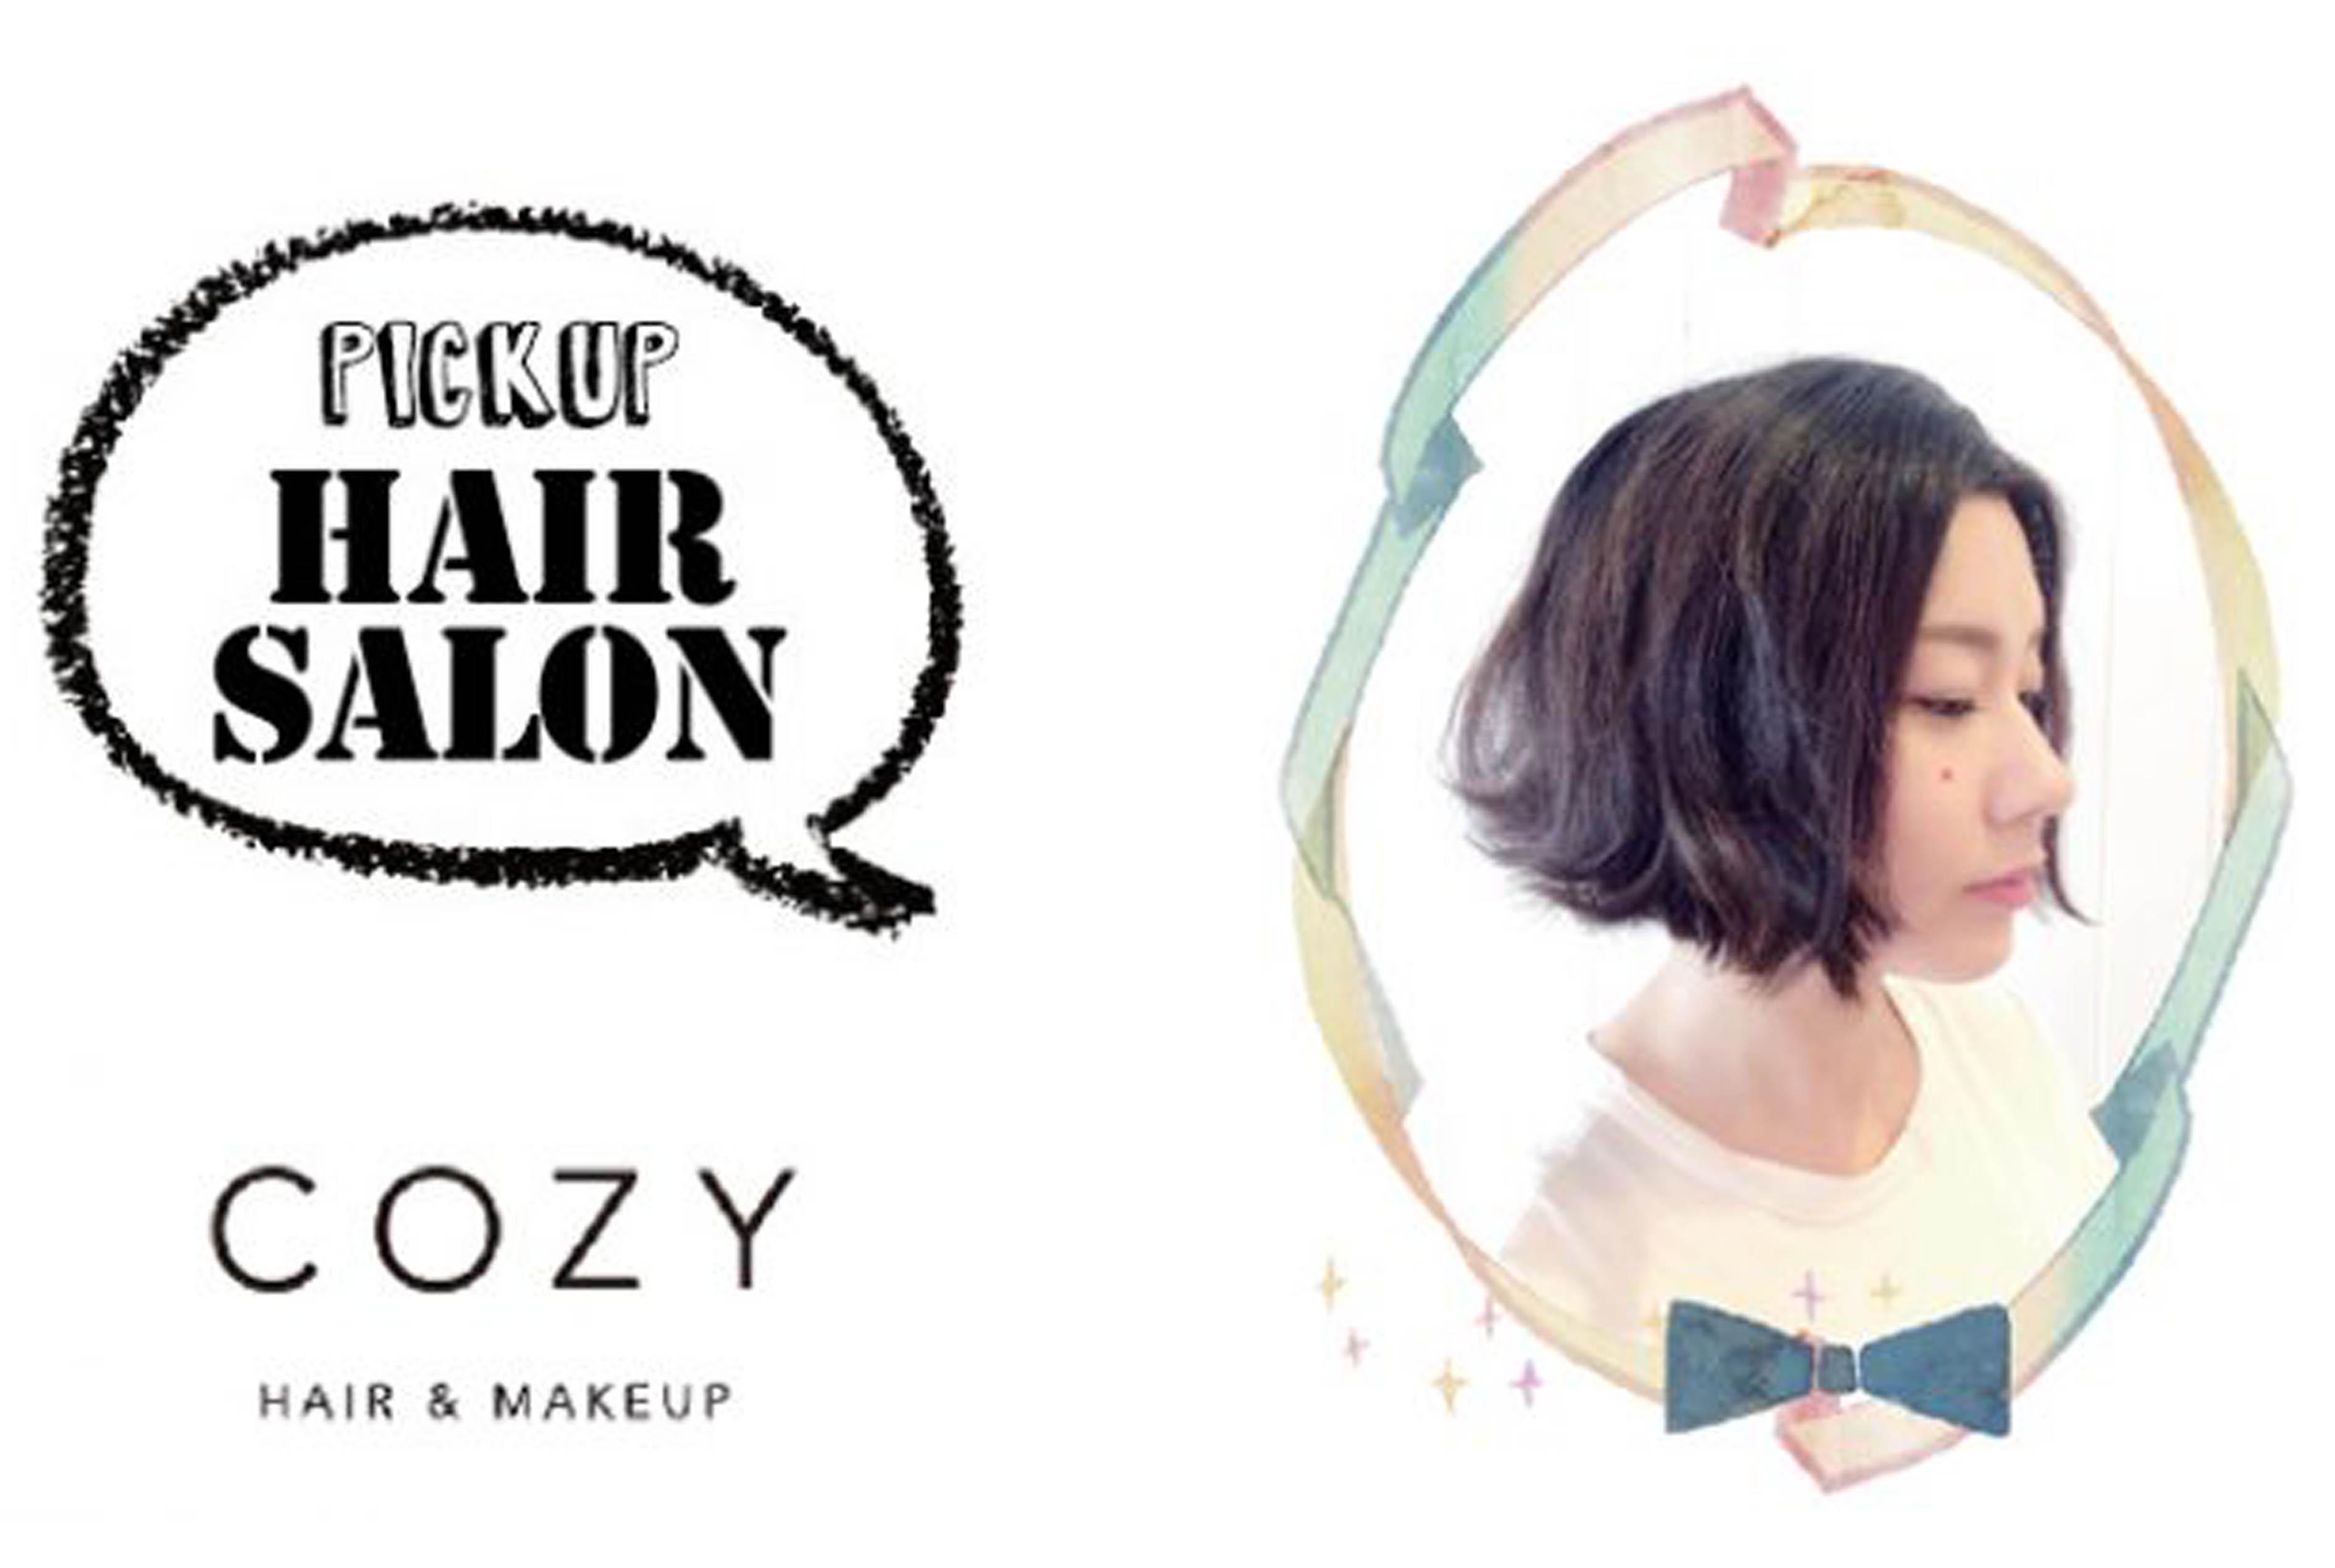 【PICK UP HAIR SALON】 COZY